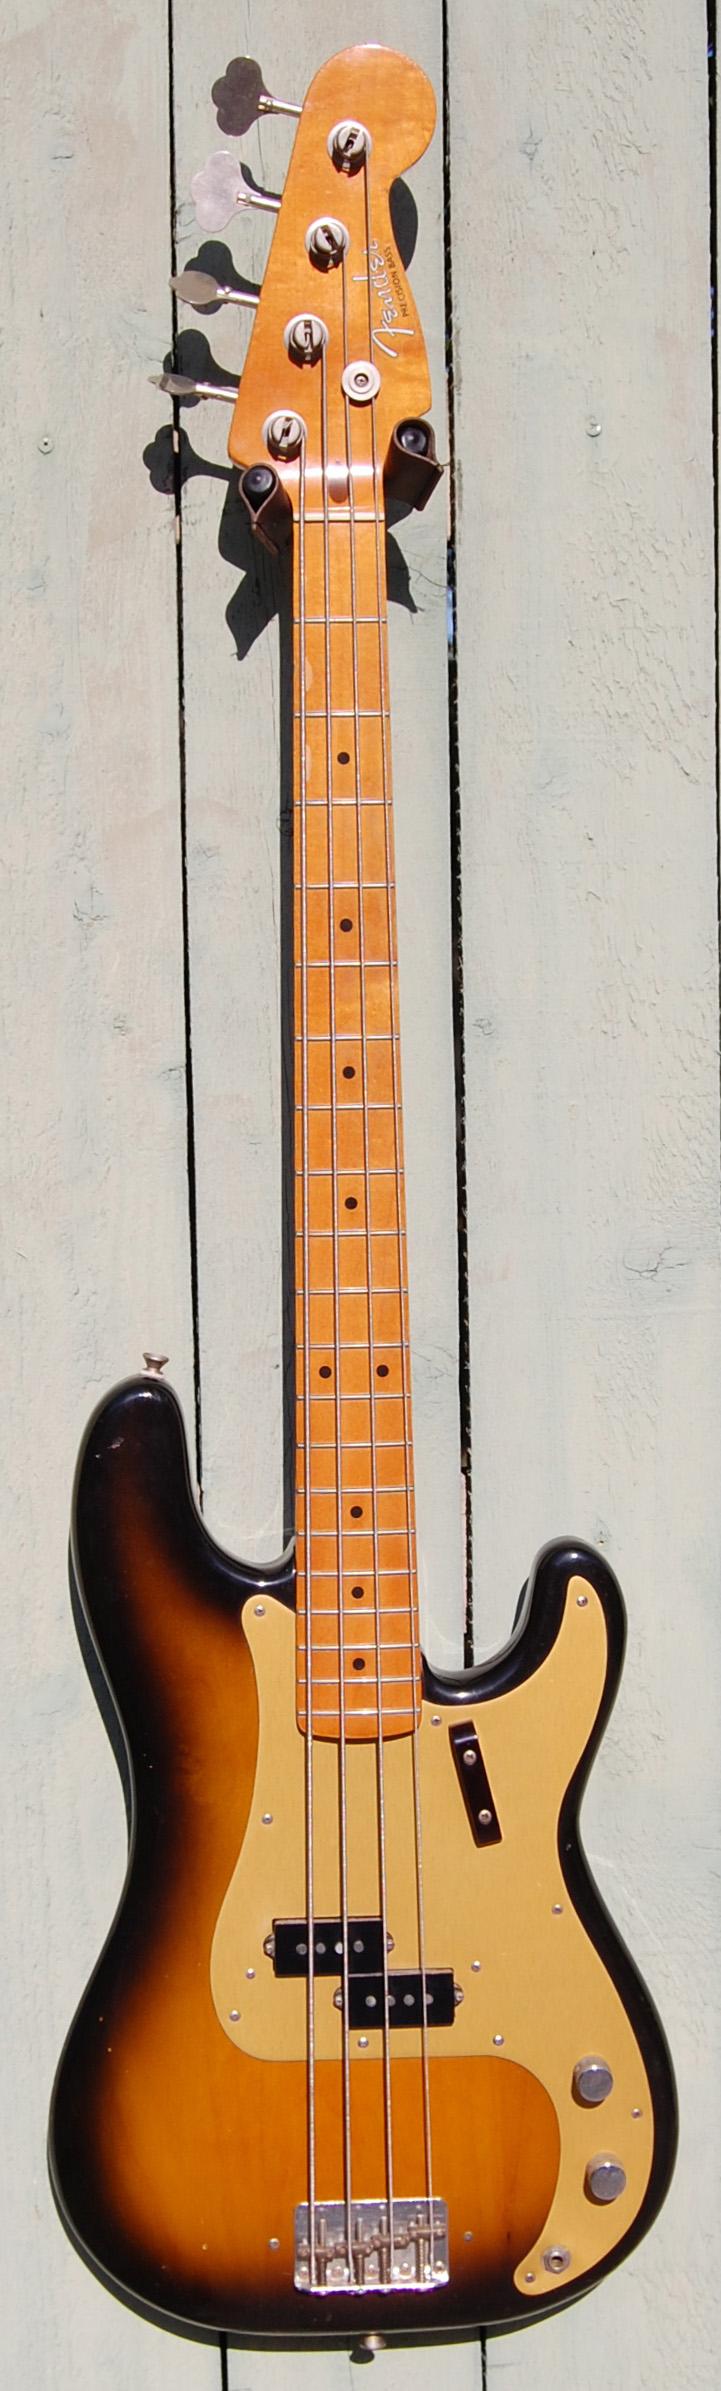 1982 Precision Bass